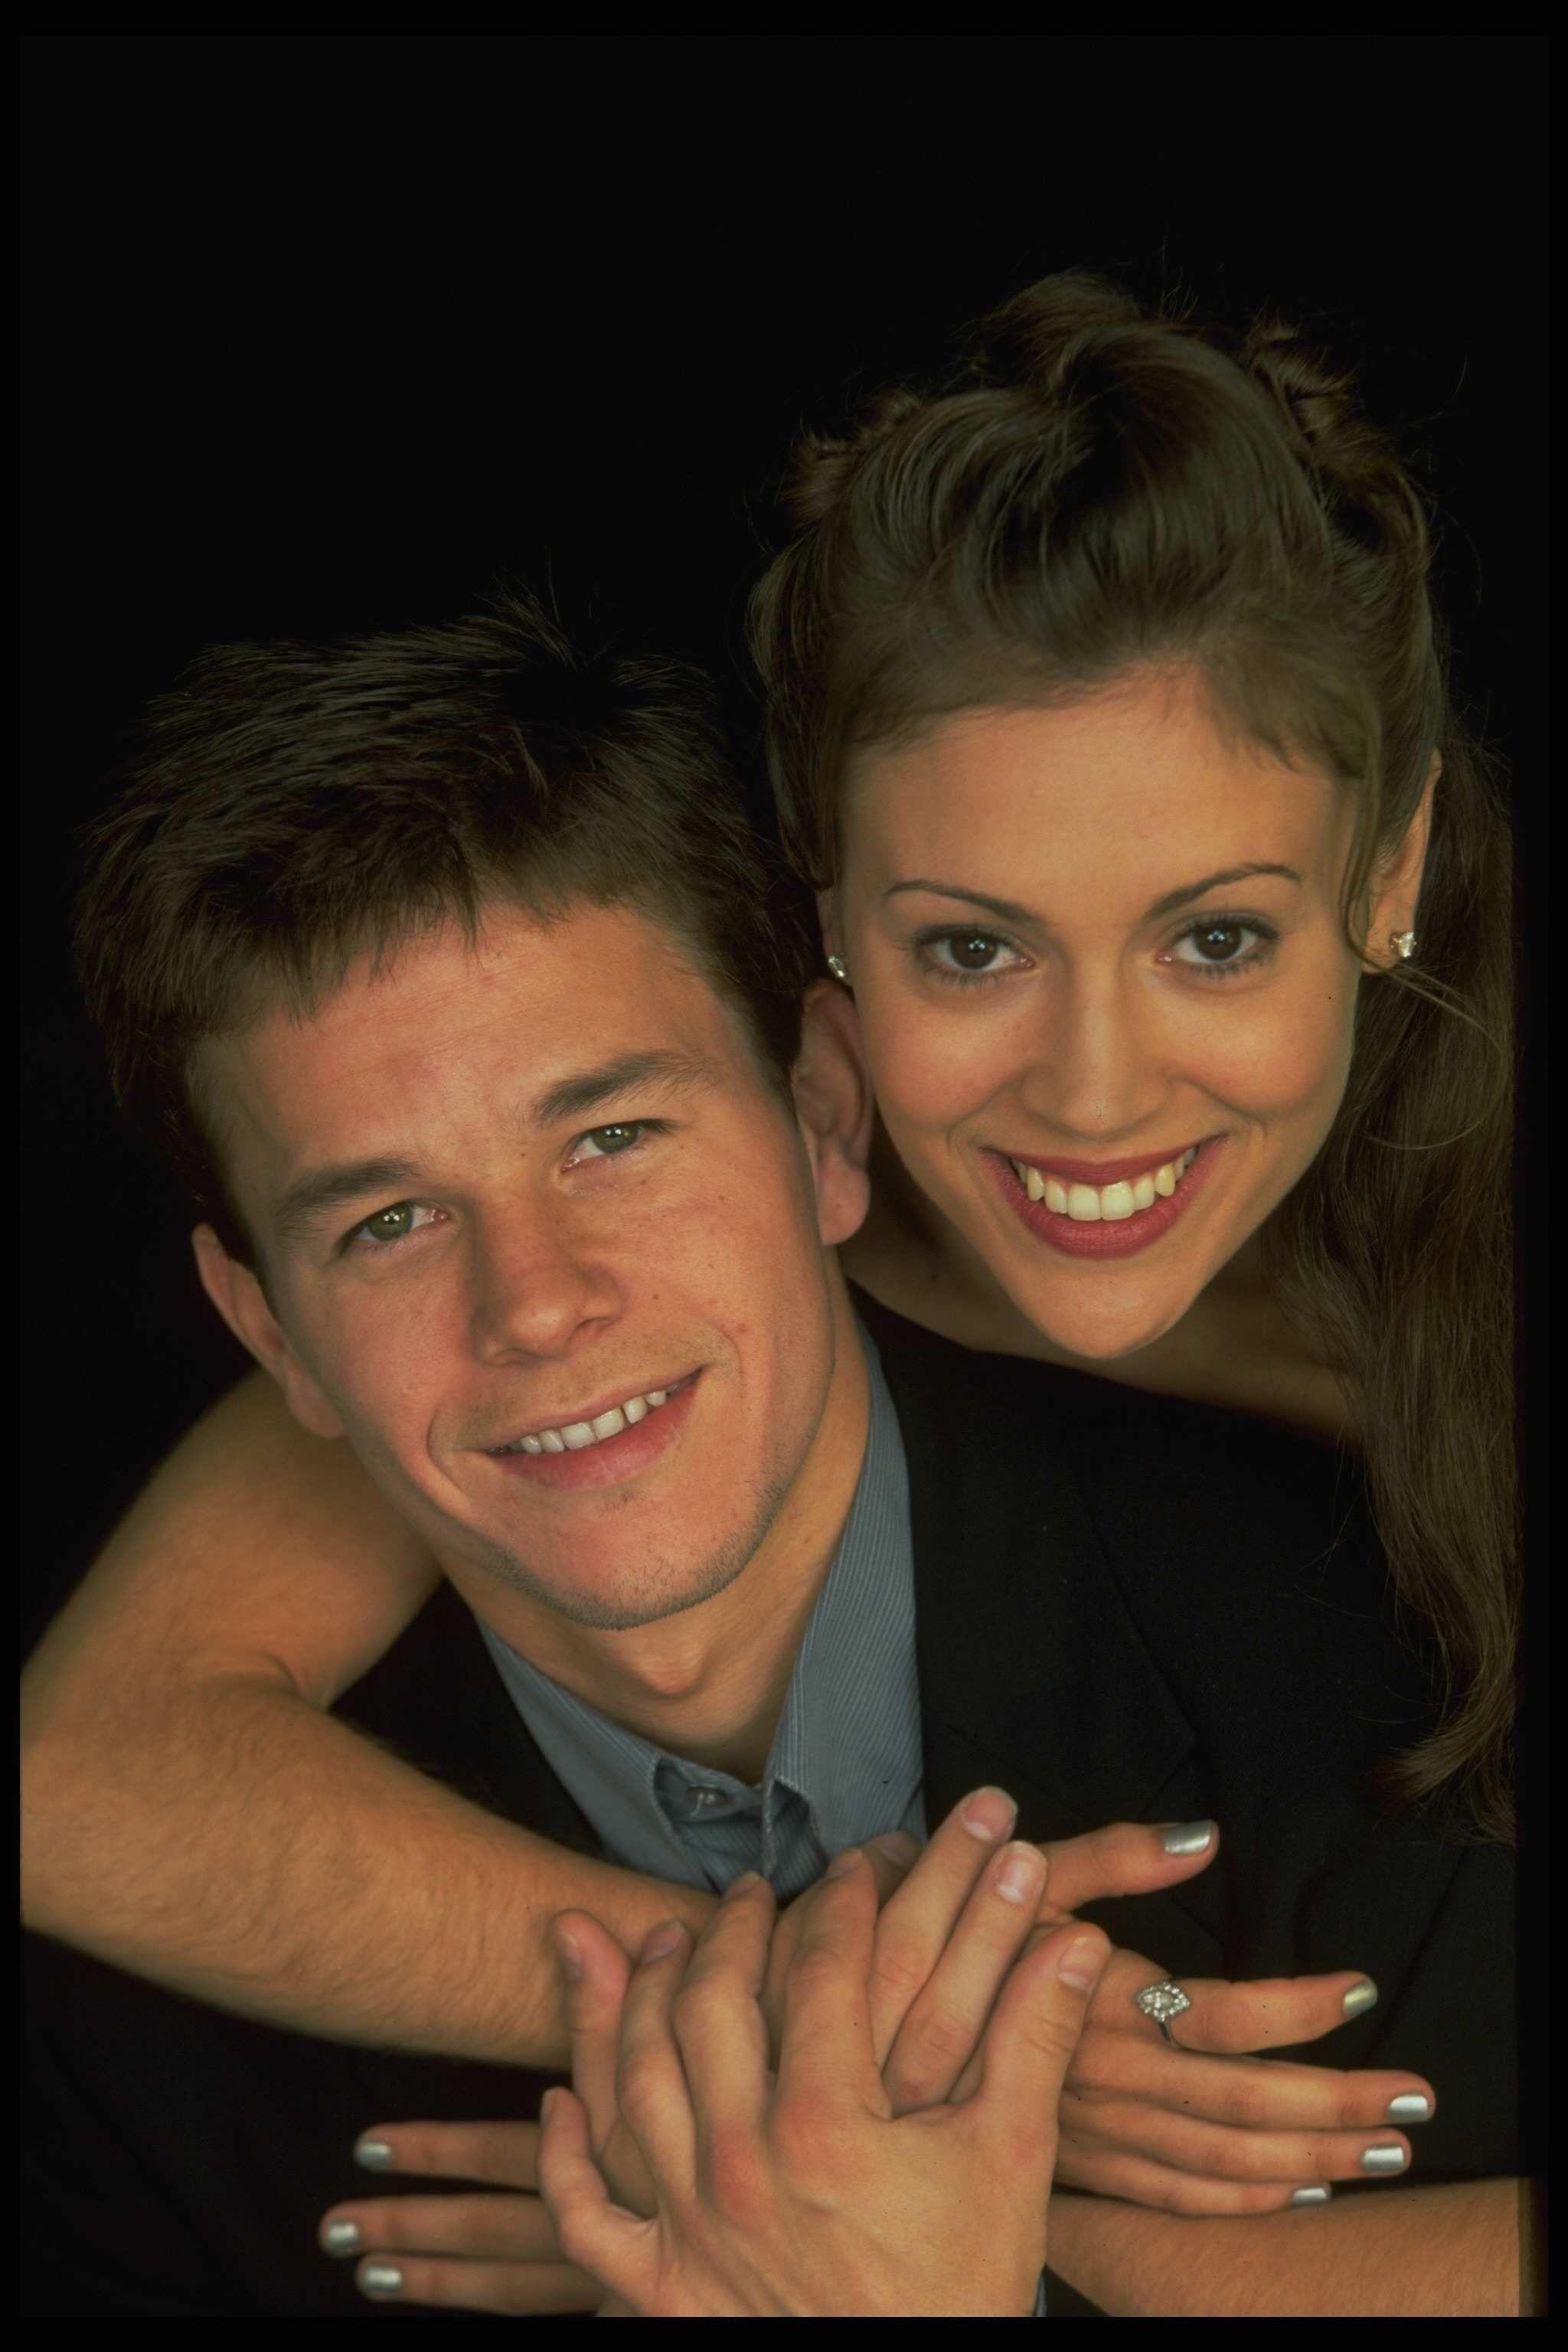 Alyssa Milano Movie Clips mark wahlberg and alyssa milanoeric roberts, 1996